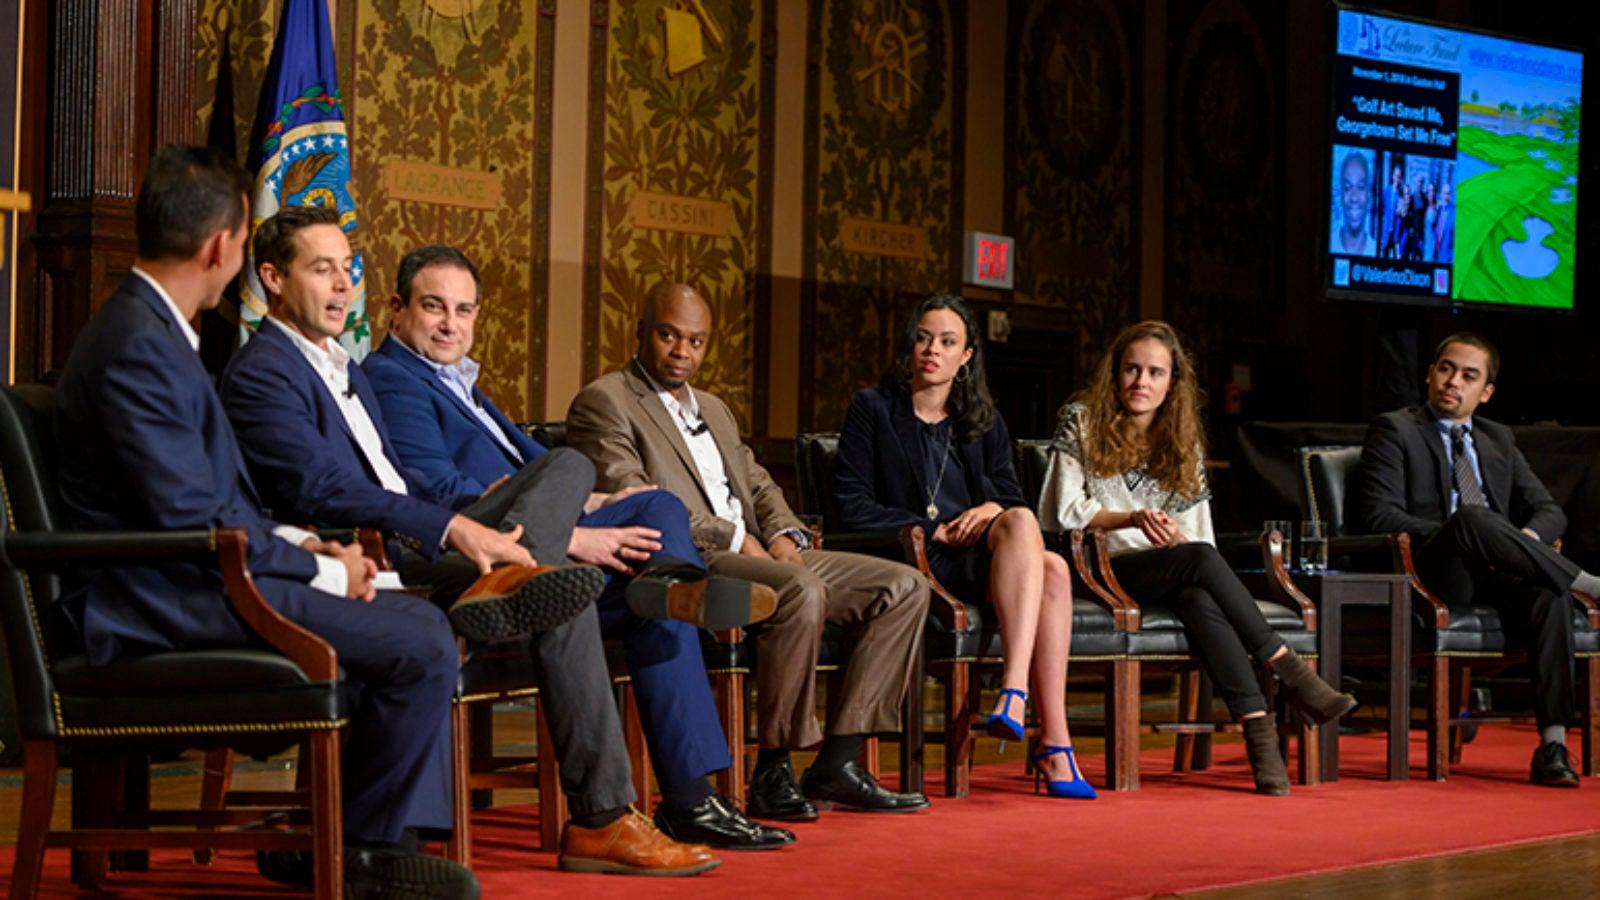 Marc Howard, Max Adler, Valentino Dixon, Isobella Goonetillake, Julie Fragonas and Naoya Johnson sitting onstage in Gaston Hall